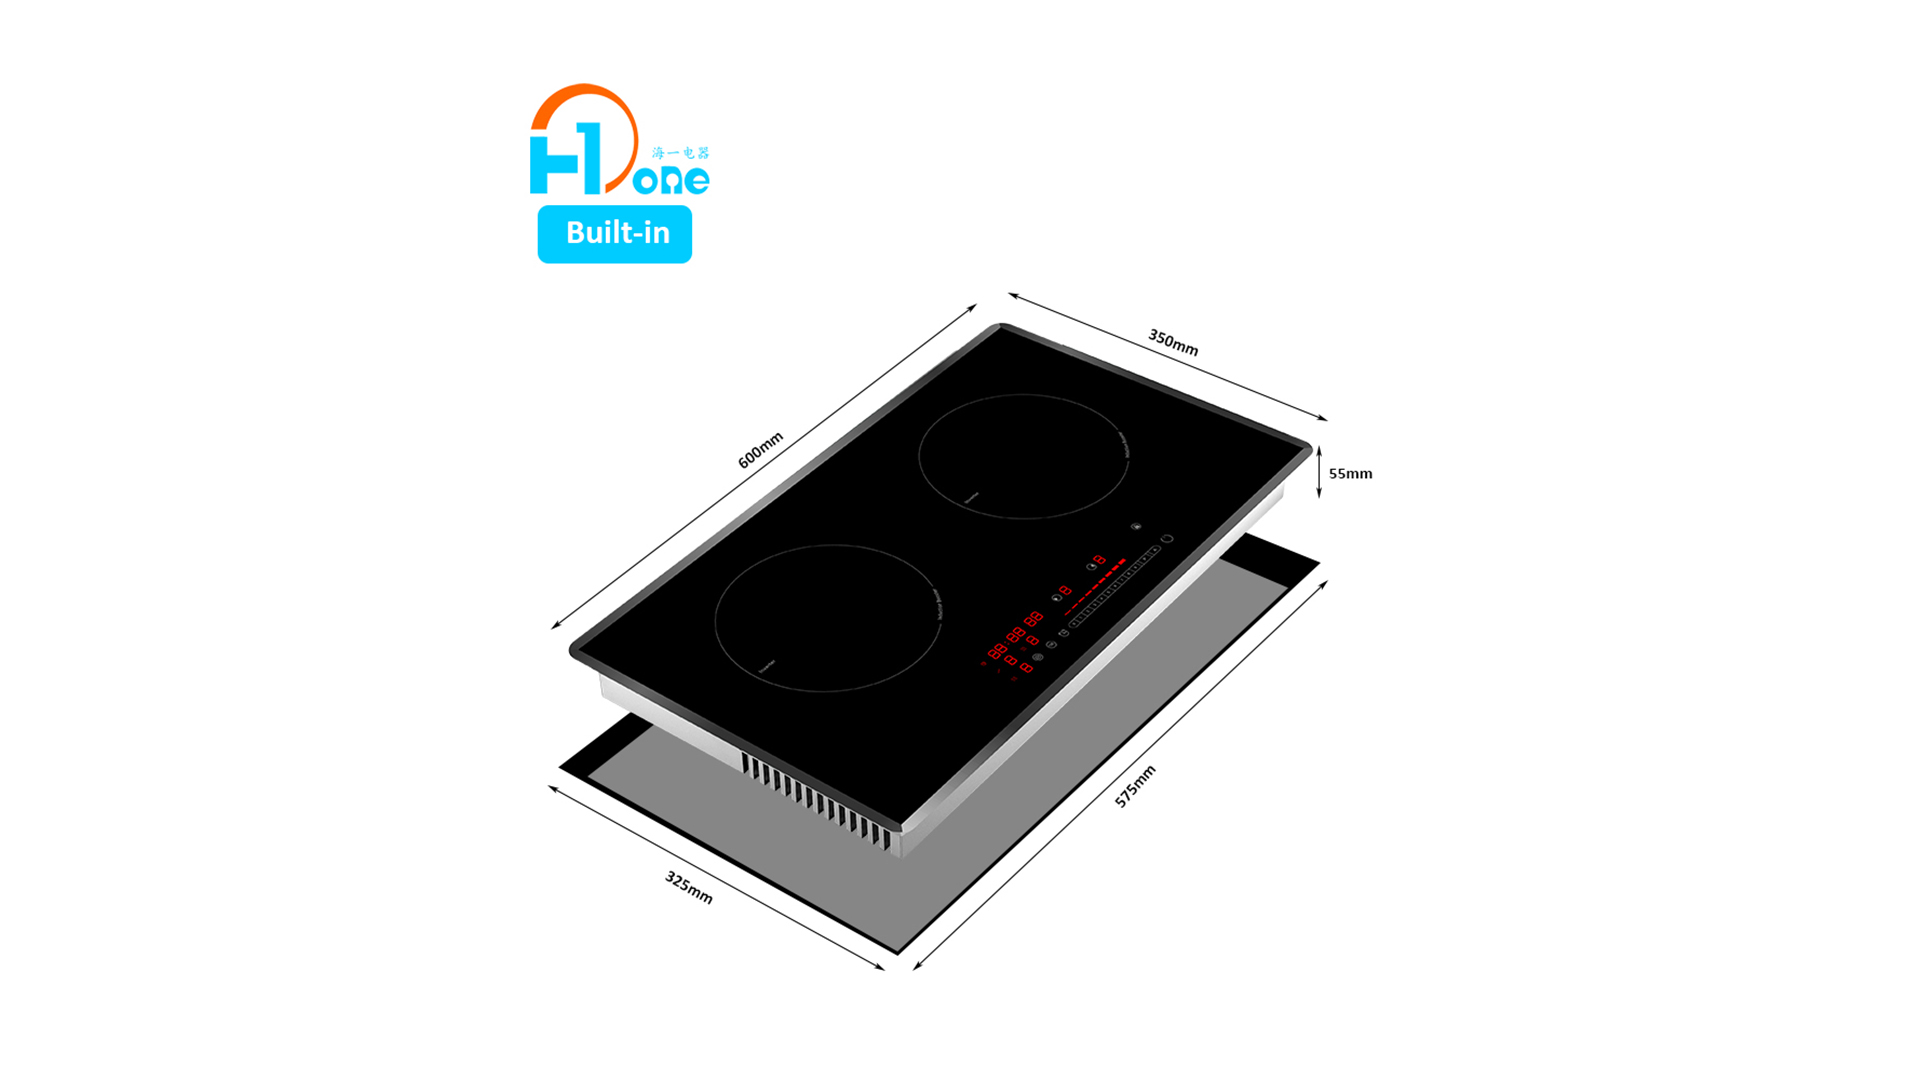 Chinese Original Design Manufacturer Shenzhen H-one Half Bridge Induction Technology Built-in Induction Cooker 8120-255